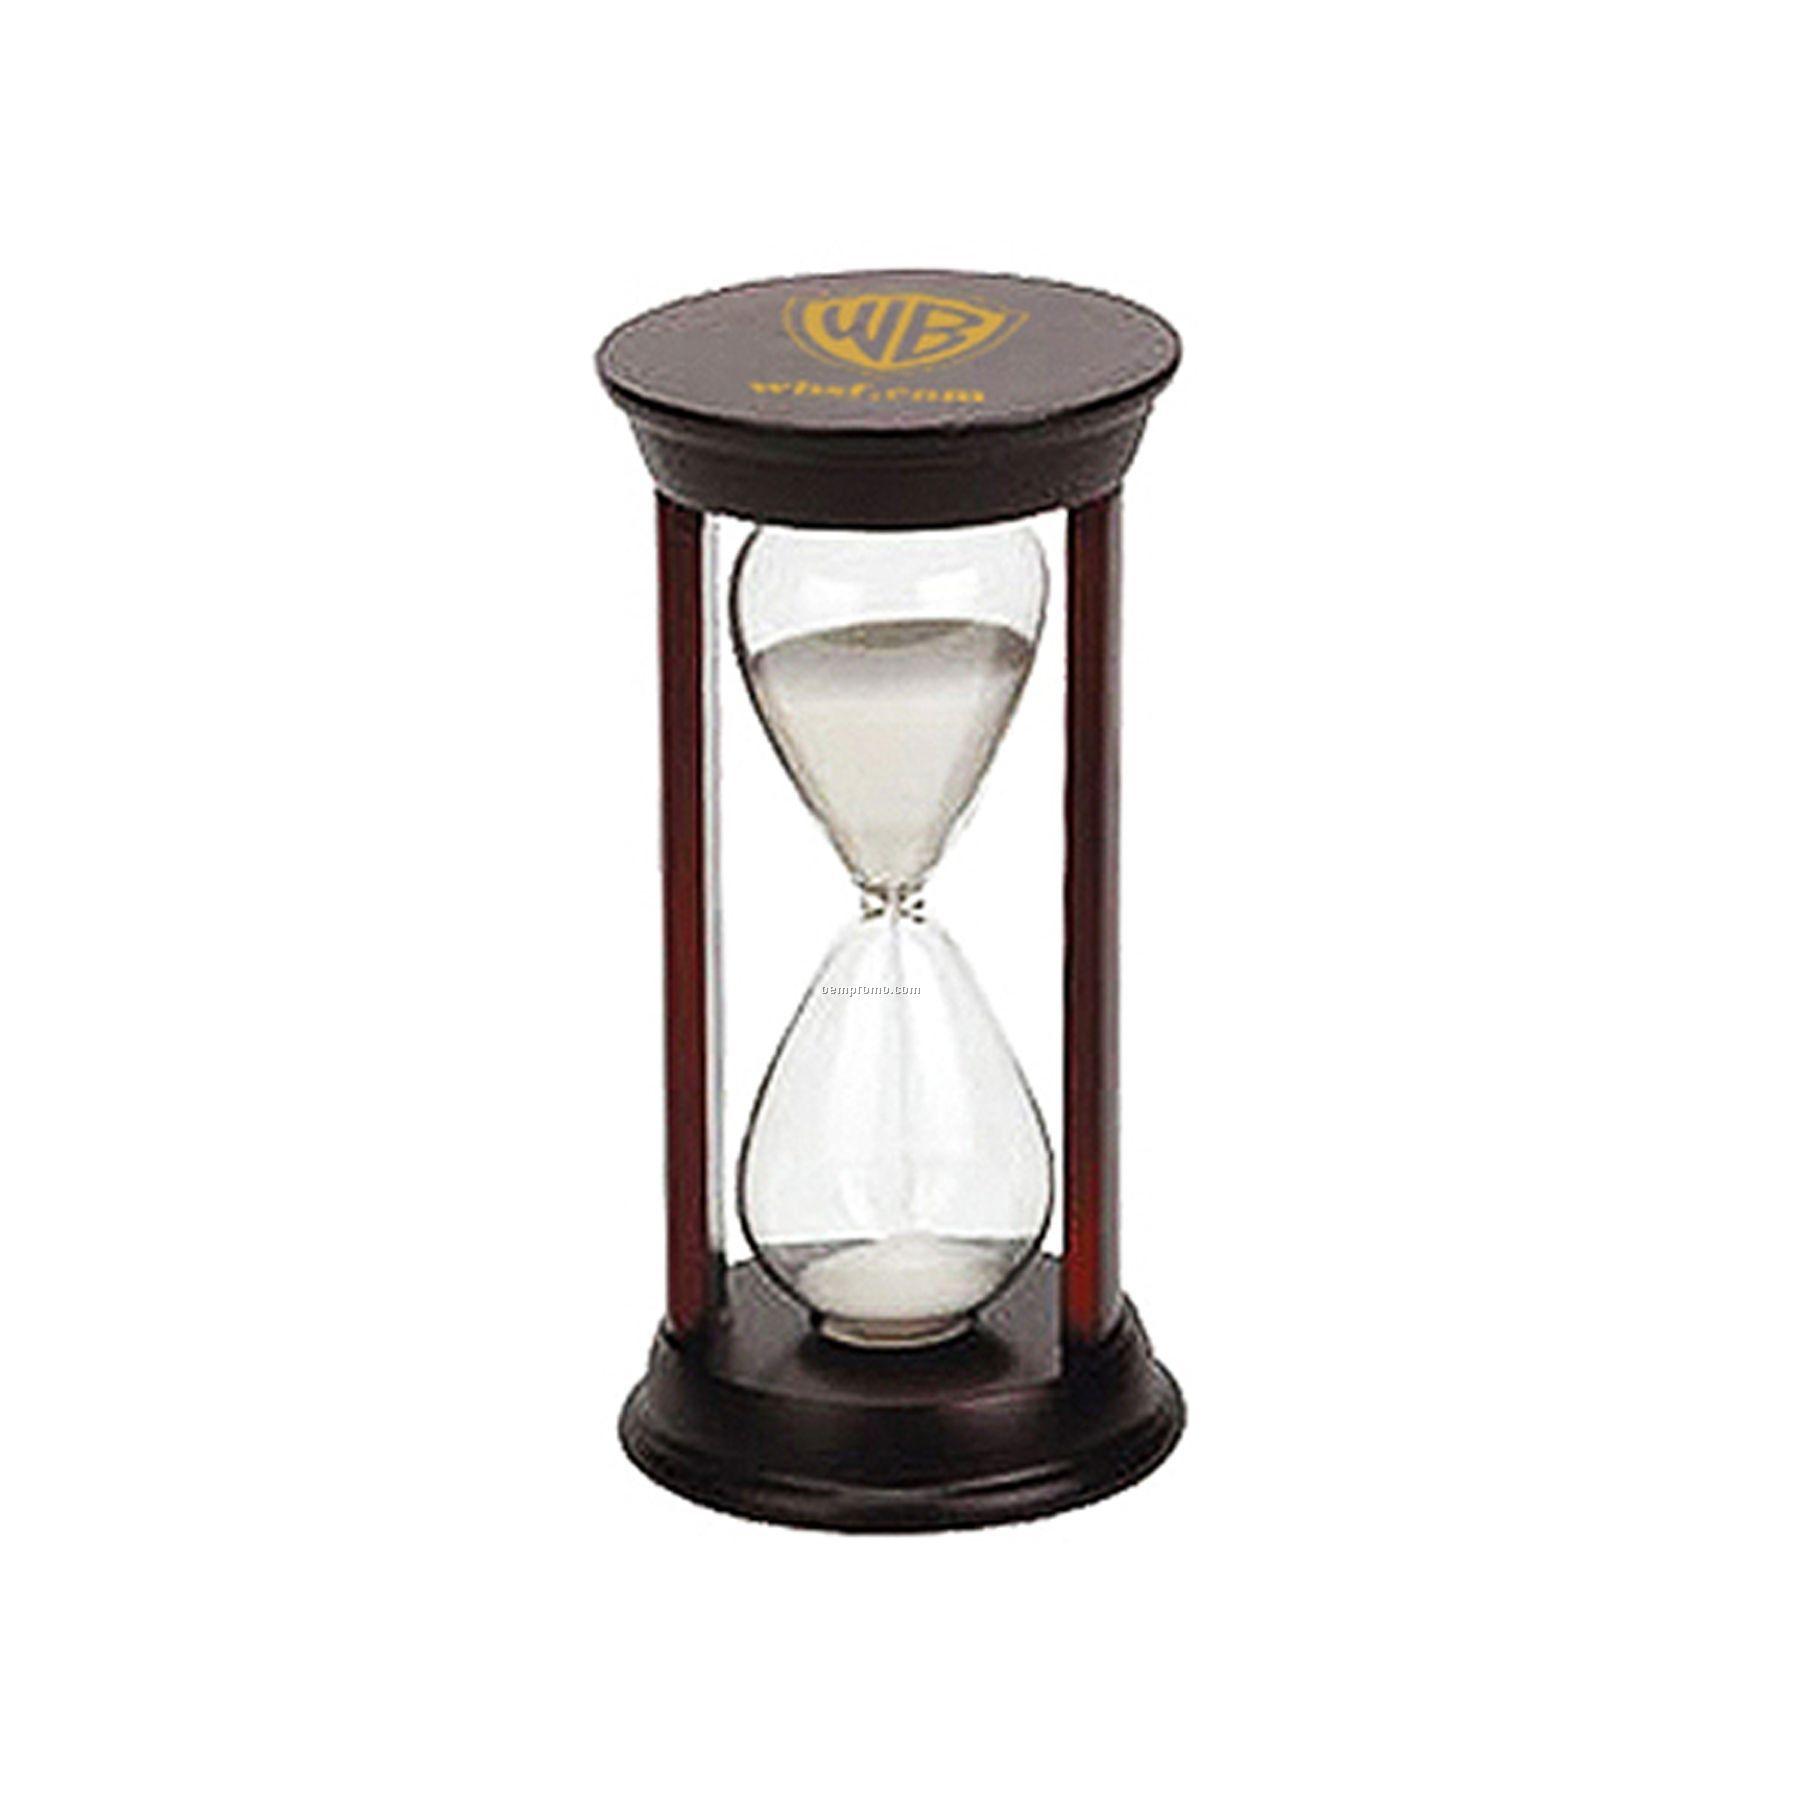 Joyce 7 Minute Classic Sandtimer,China Wholesale Joyce 7 Minute